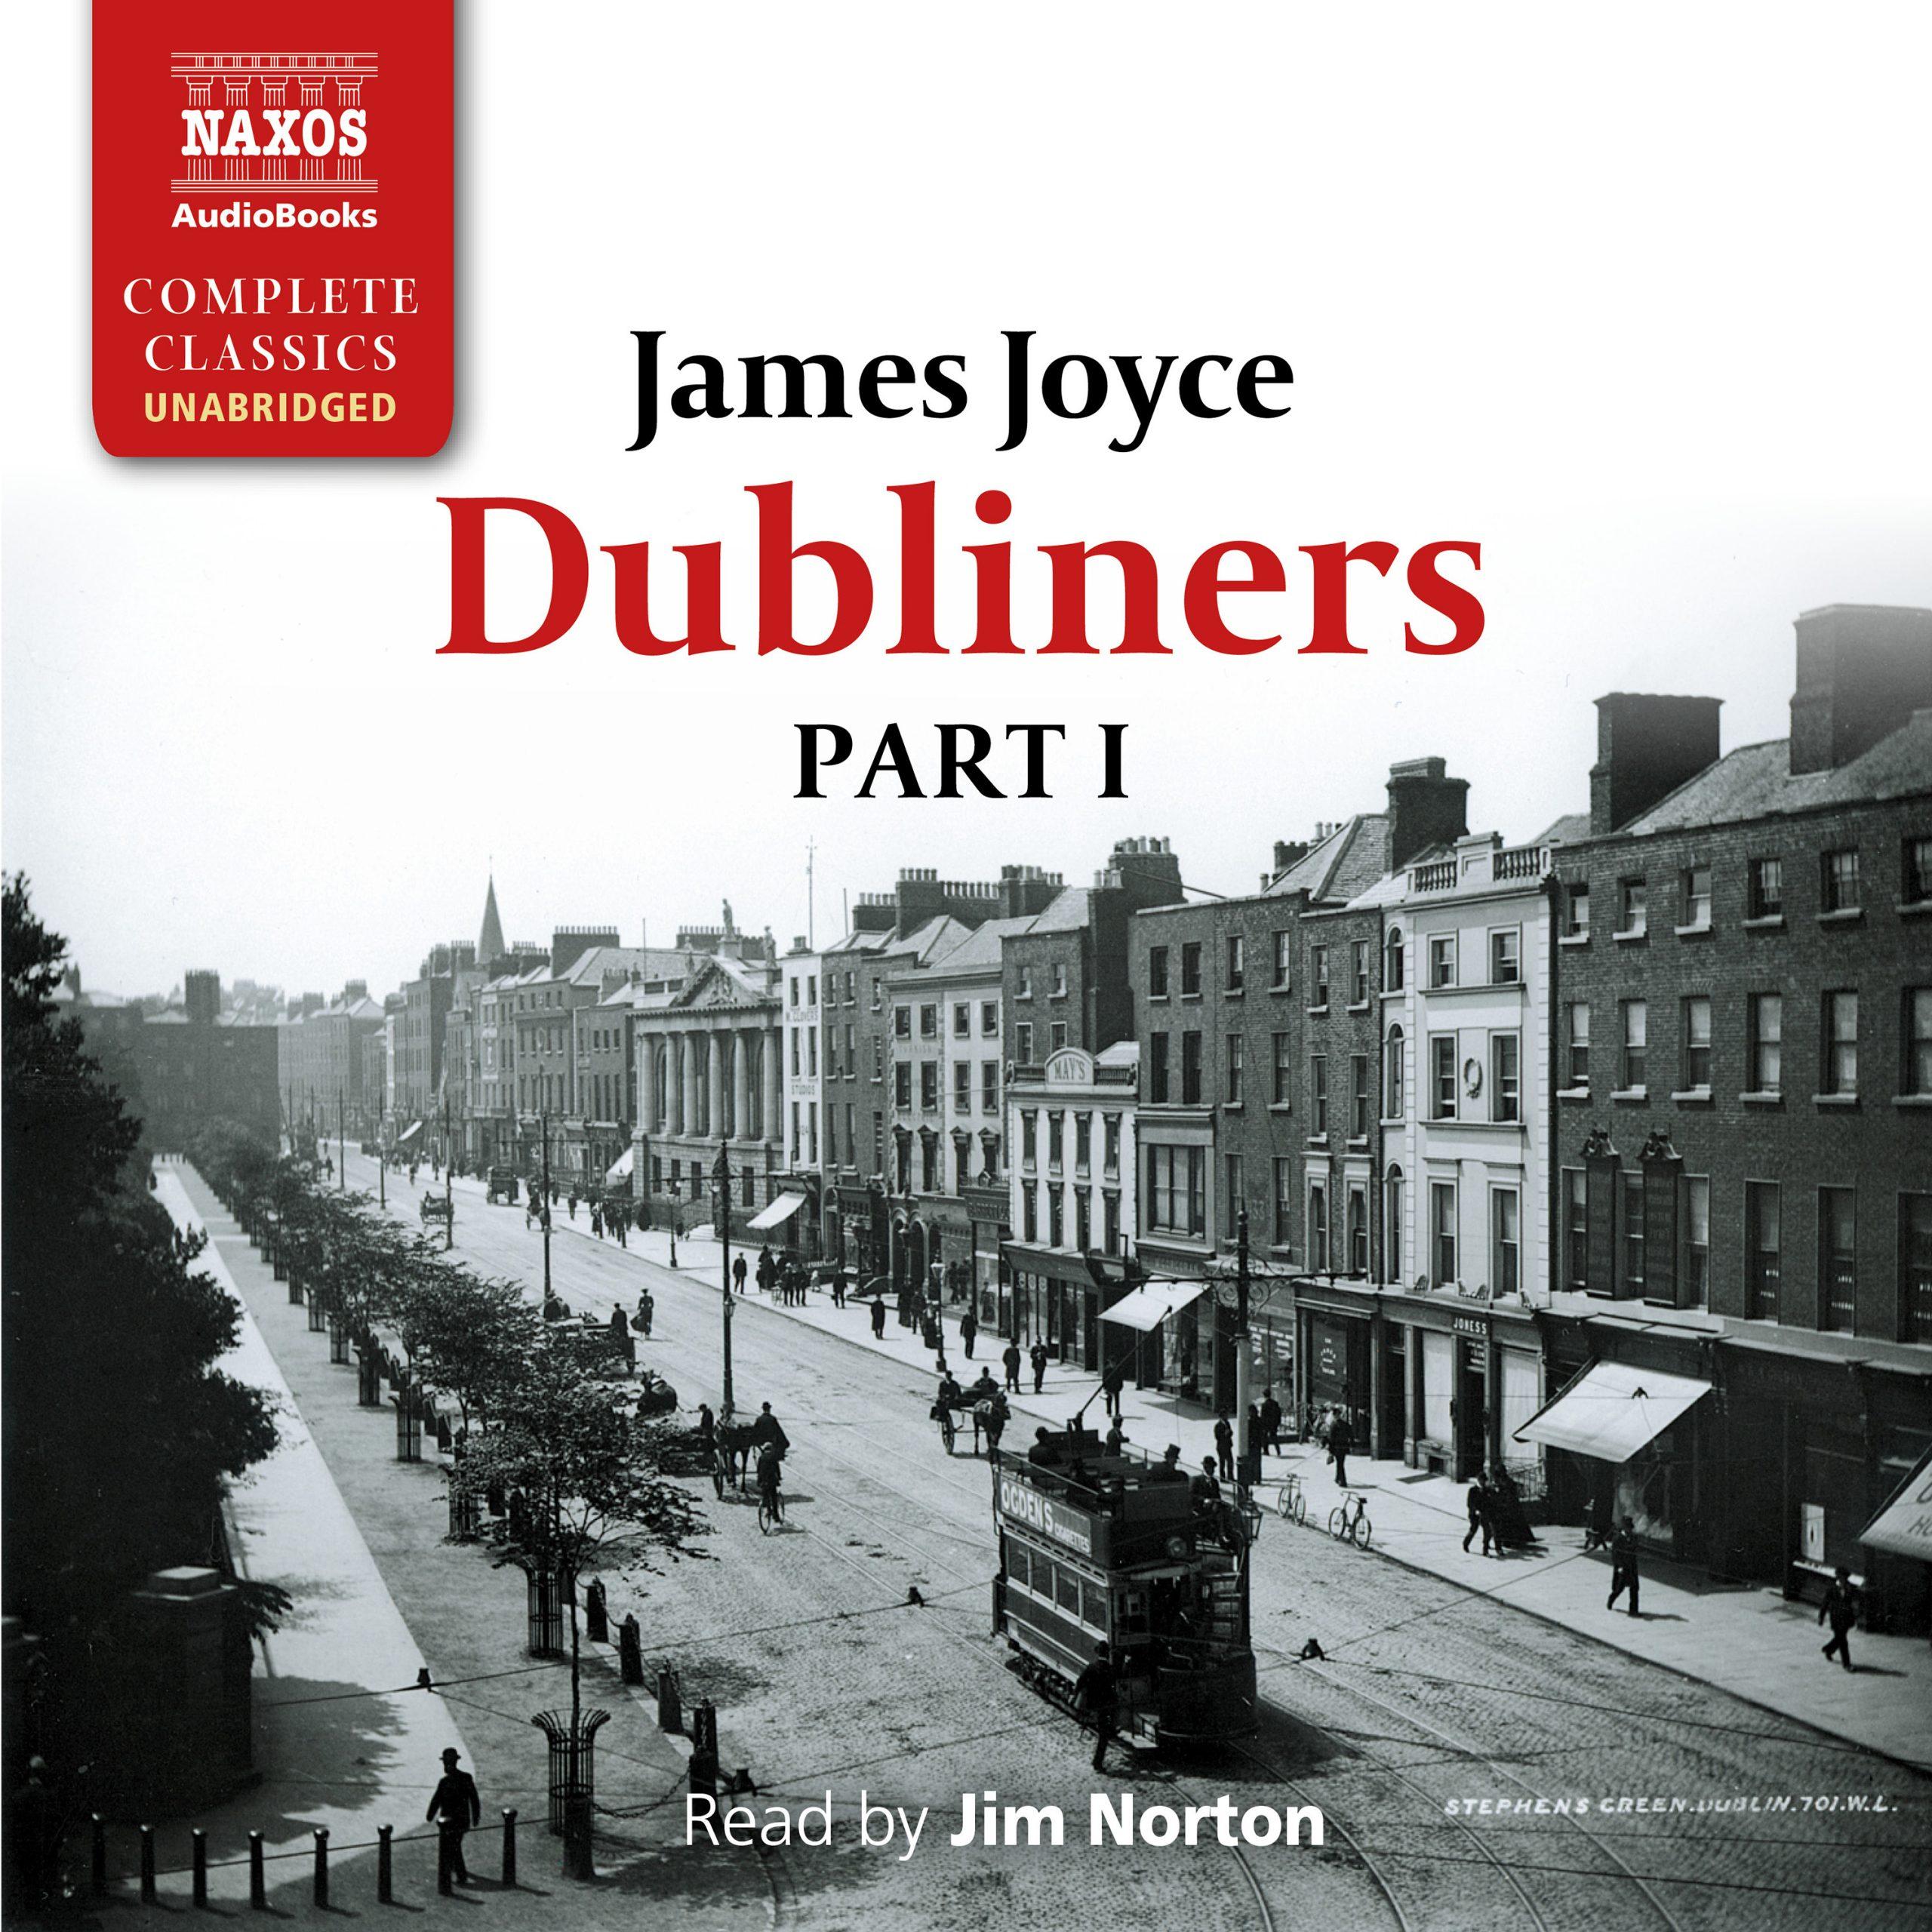 Dubliners – Part I (unabridged)